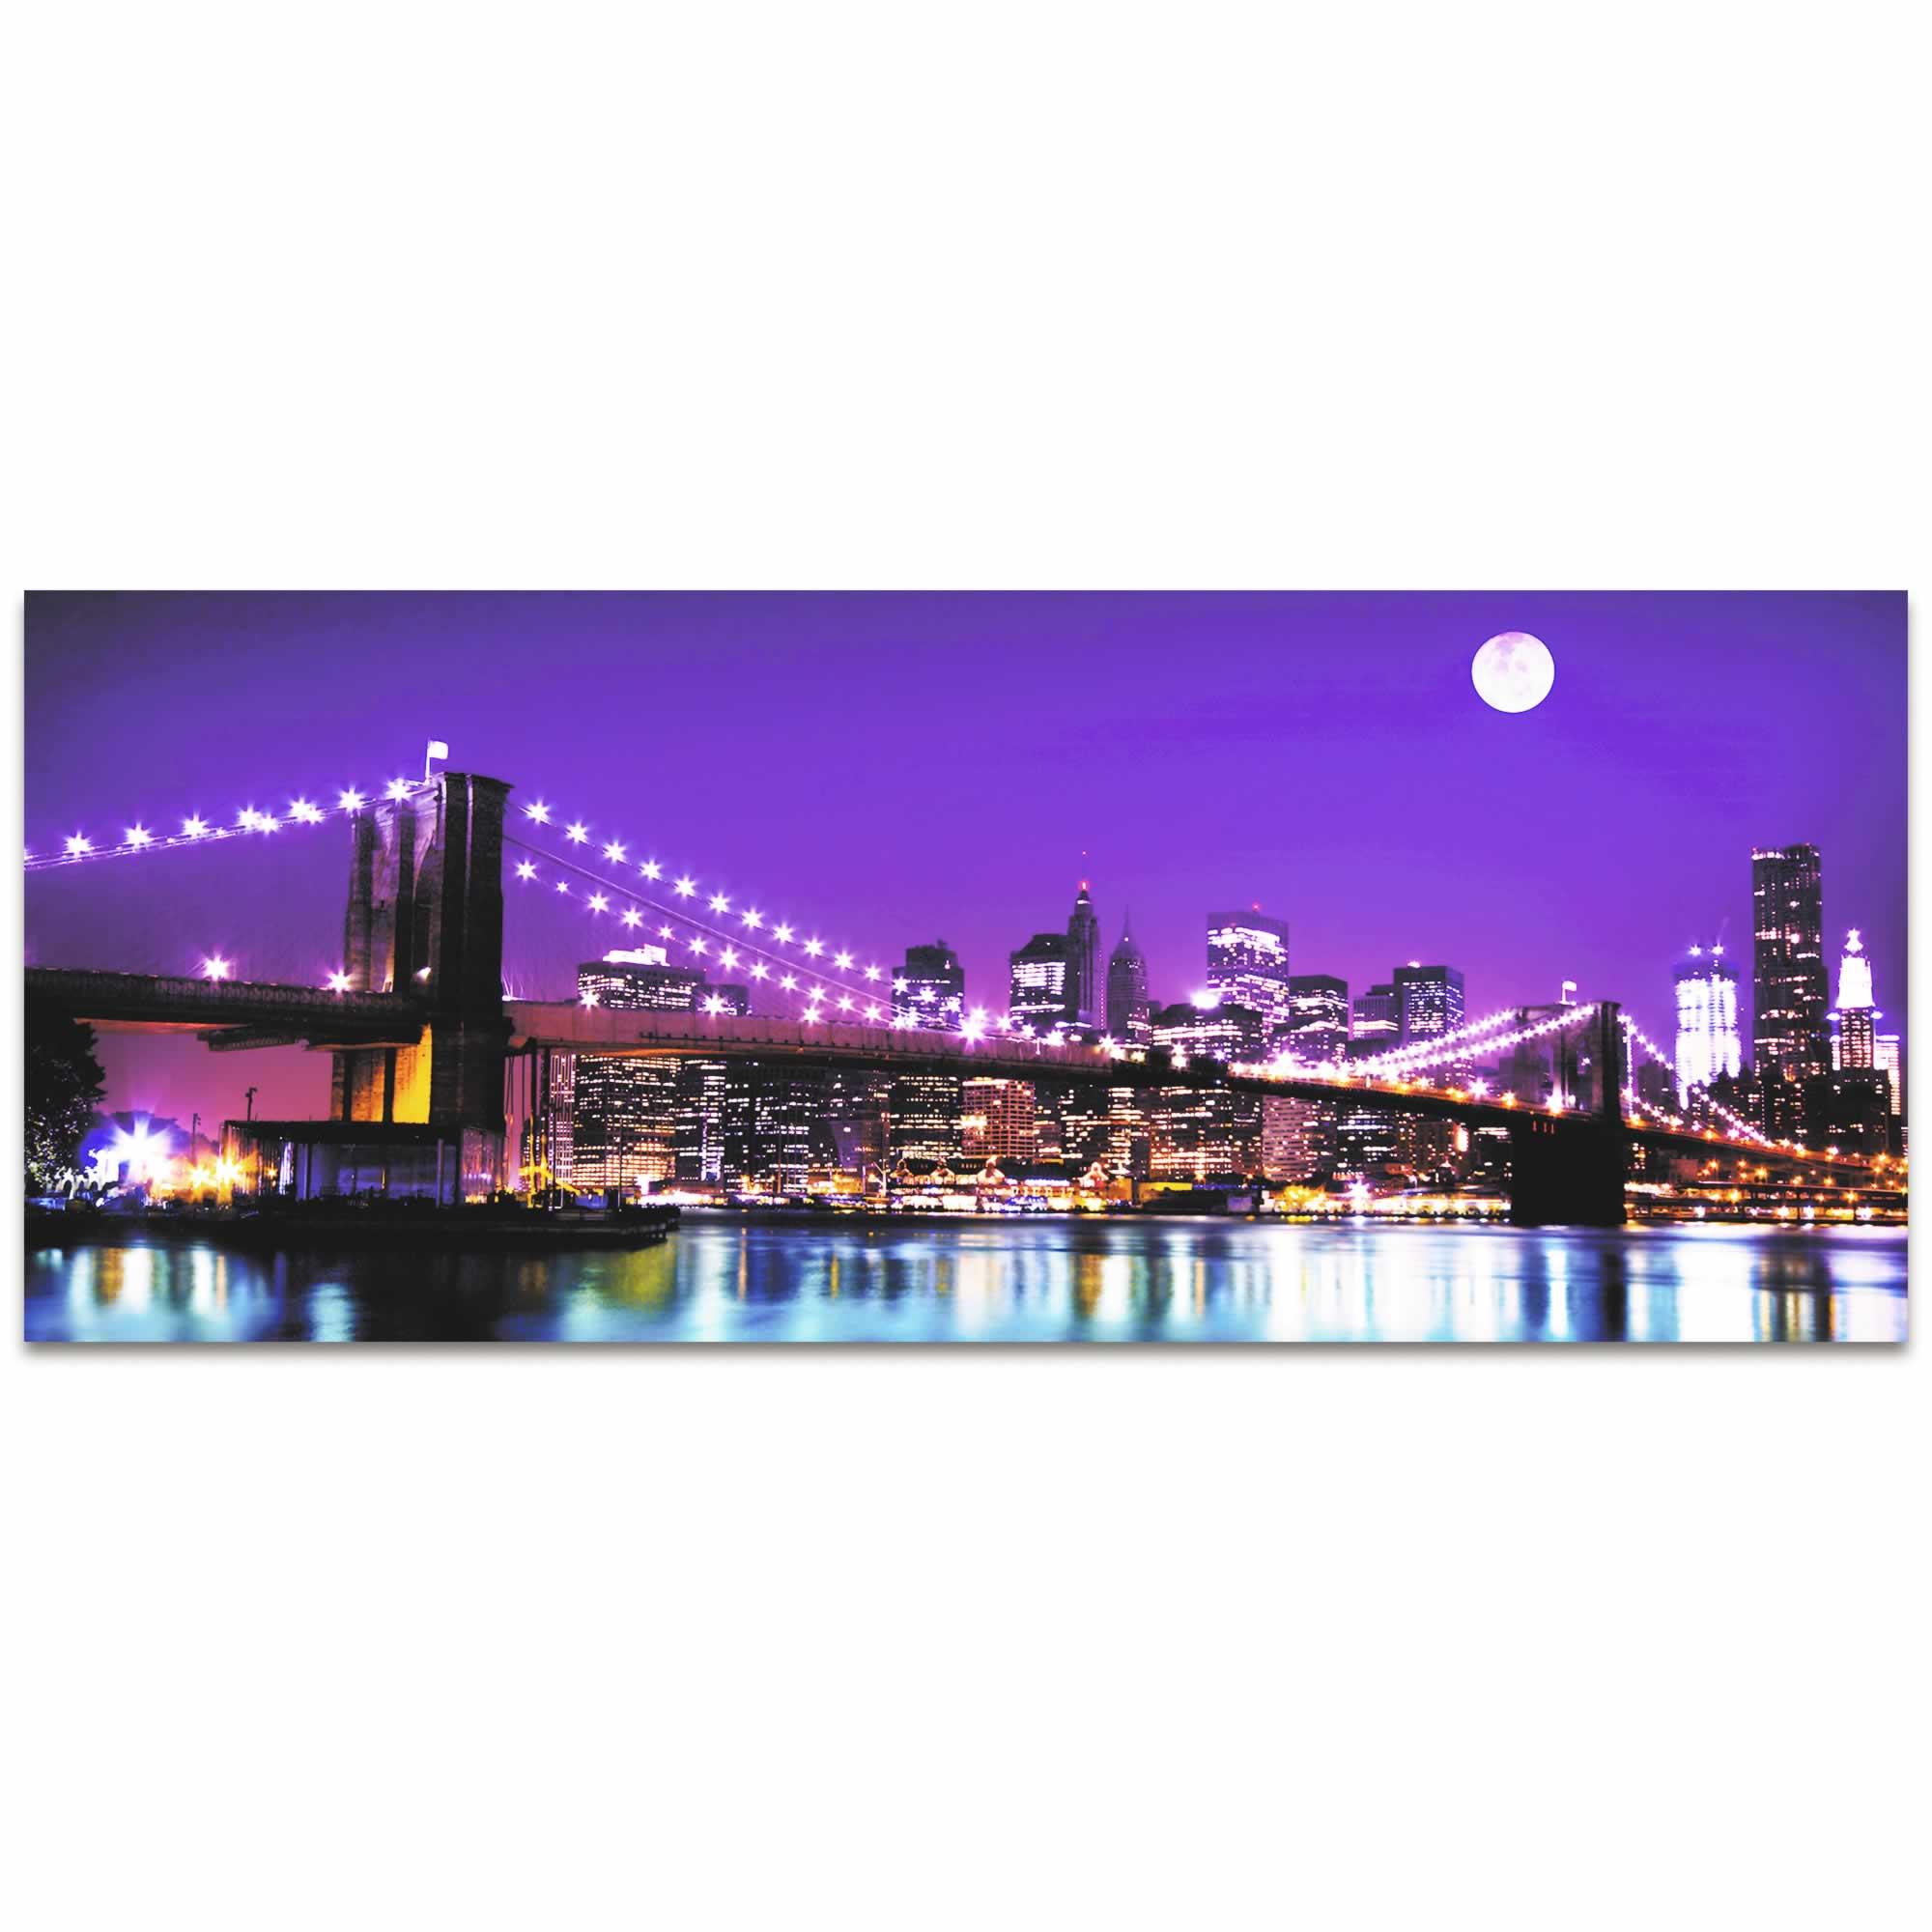 New York Bridge City Skyline - Urban Modern Art, Designer Home Decor, Cityscape Wall Artwork, Trendy Contemporary Art - Alternate View 2